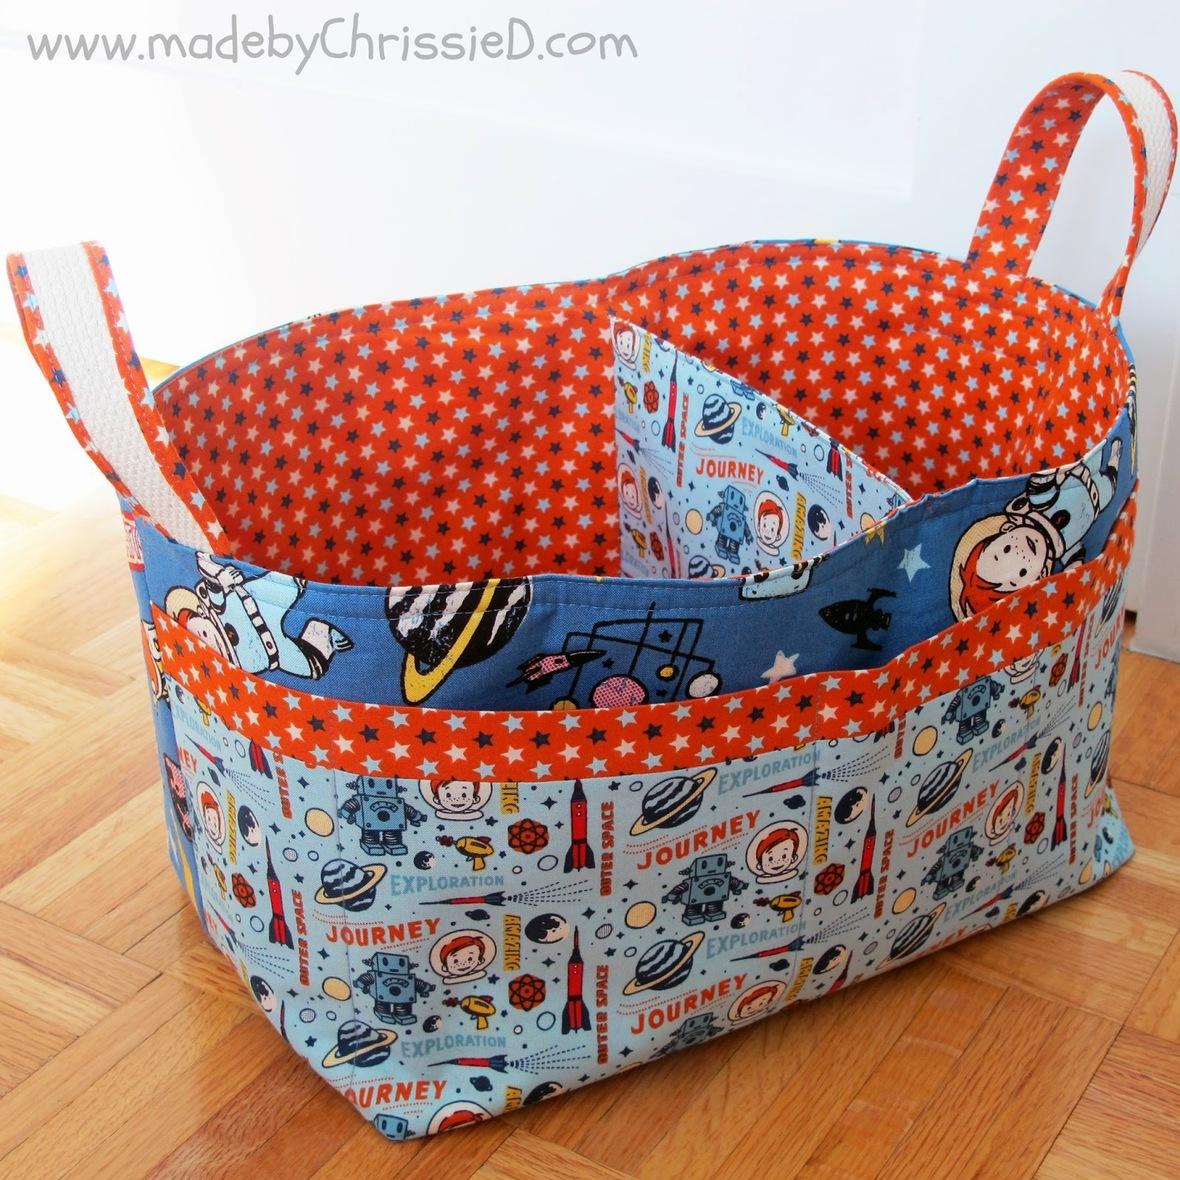 Madebychrissied- blog - nursery basket sewing tutorials- 2